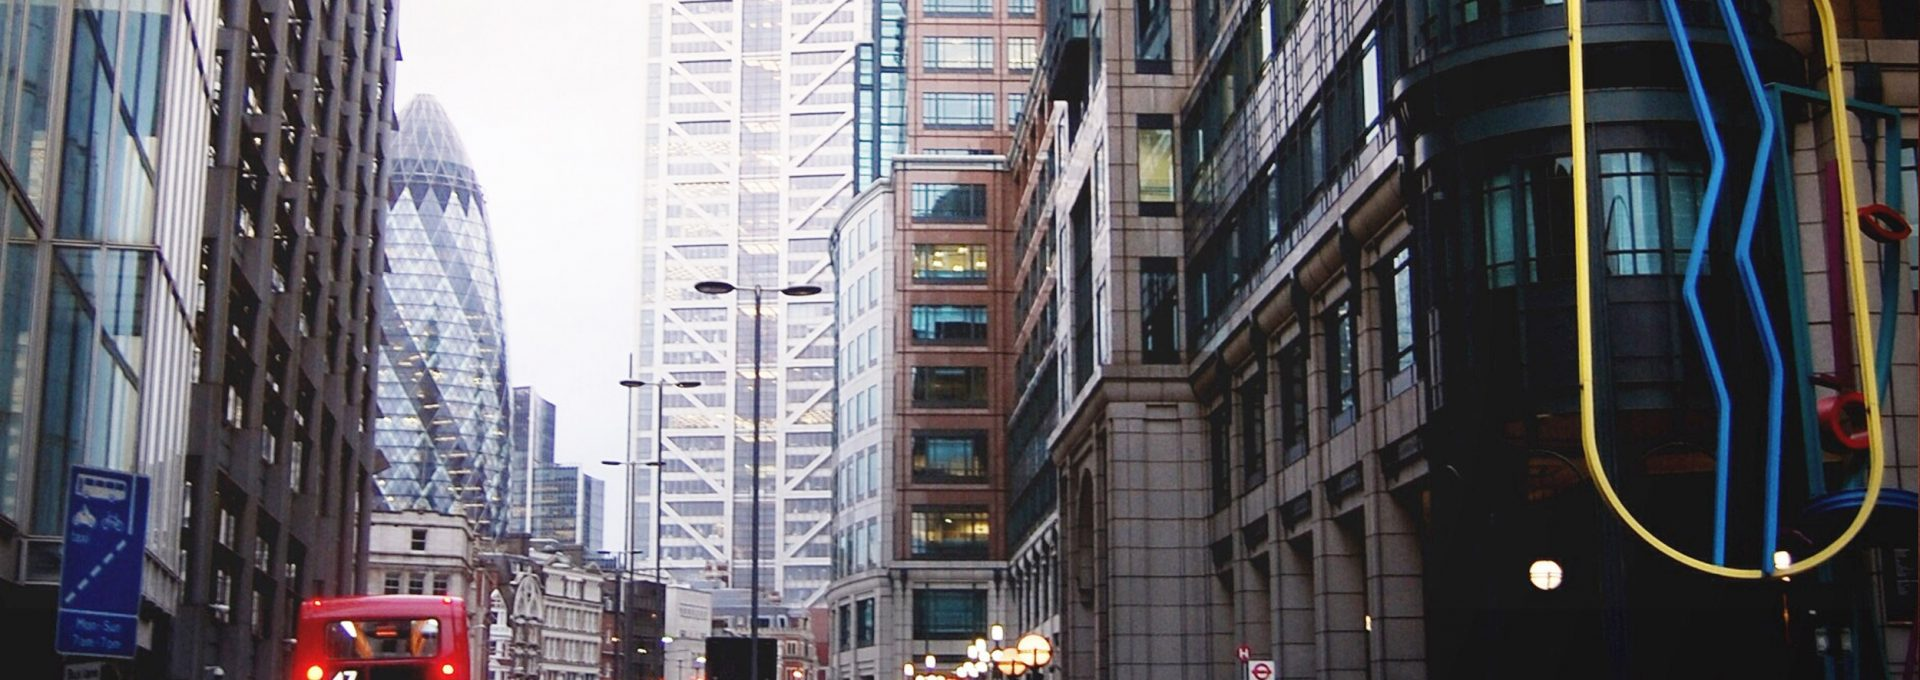 Liverpool Street, City